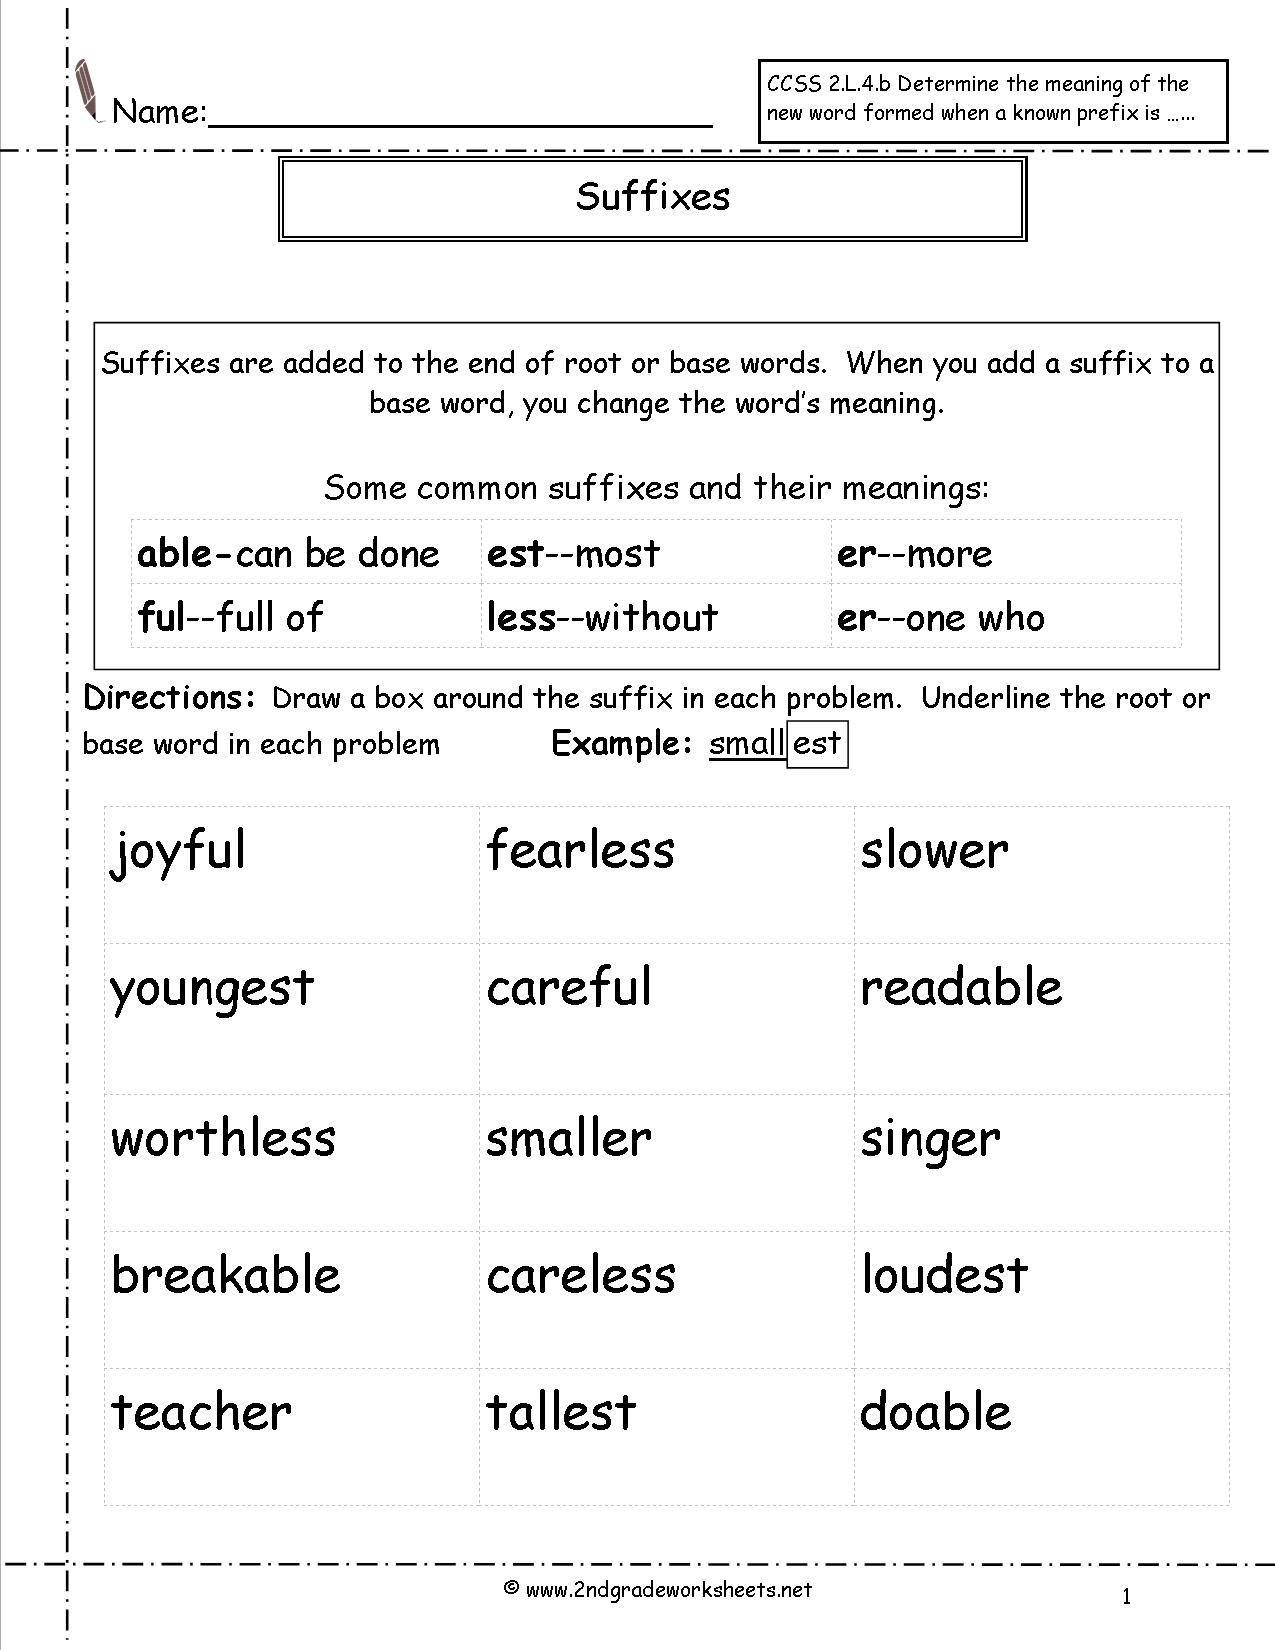 Root Words Worksheet 2nd Grade 41 Innovative Prefix Worksheets for You